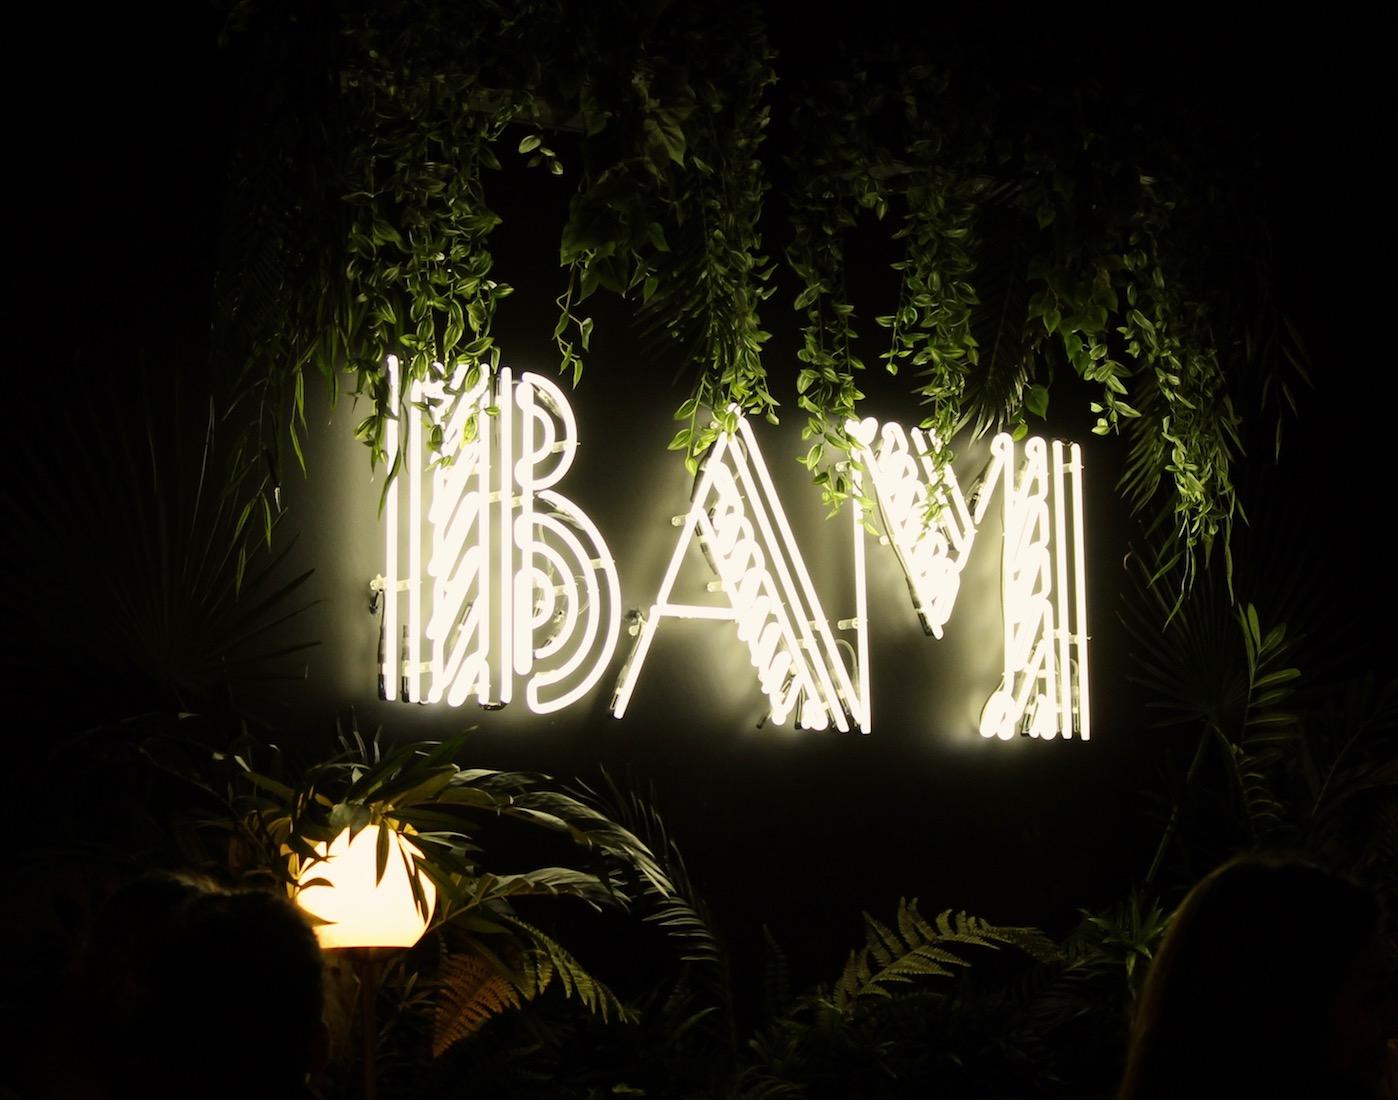 bam-karaoke-bar